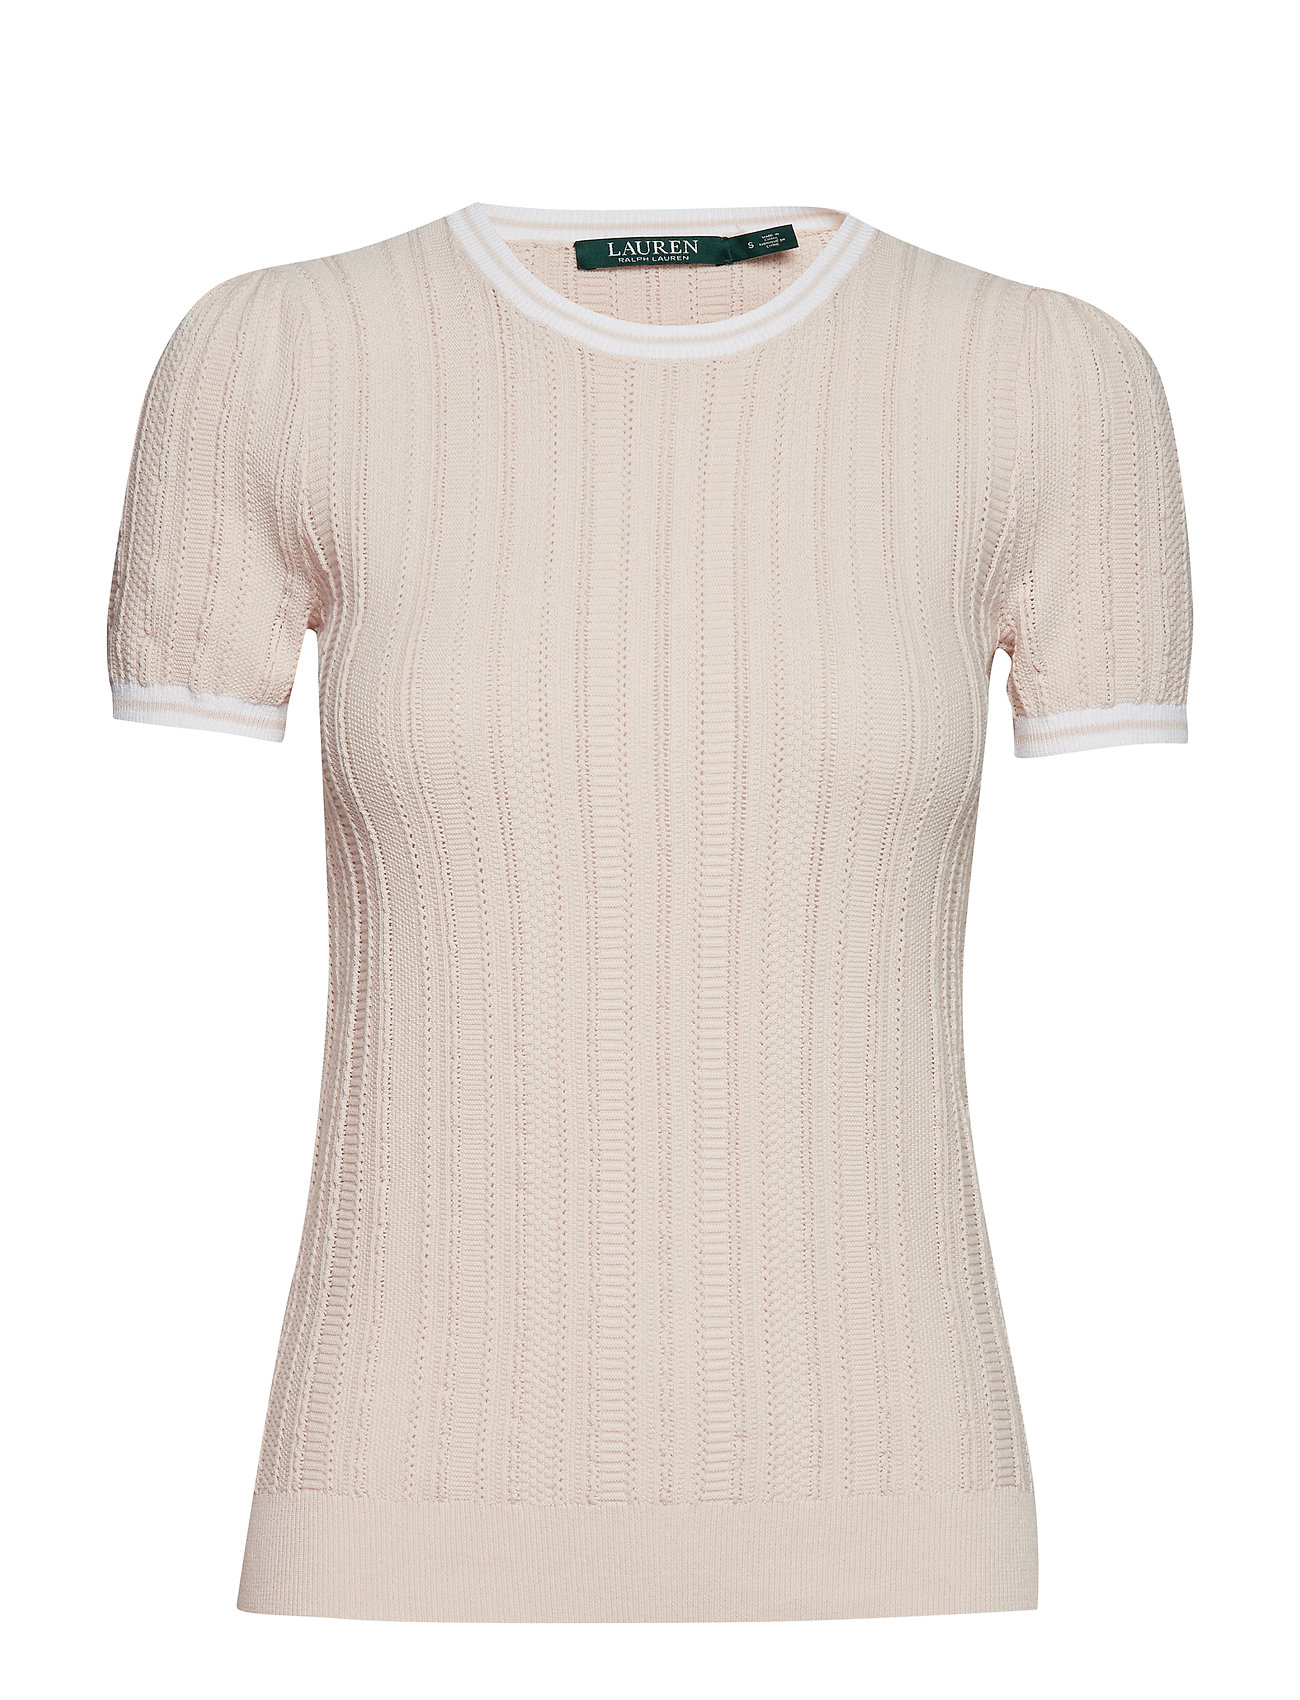 Lauren Ralph Lauren Cotton-Blend Sweater - WHITE ROSE/SILK W